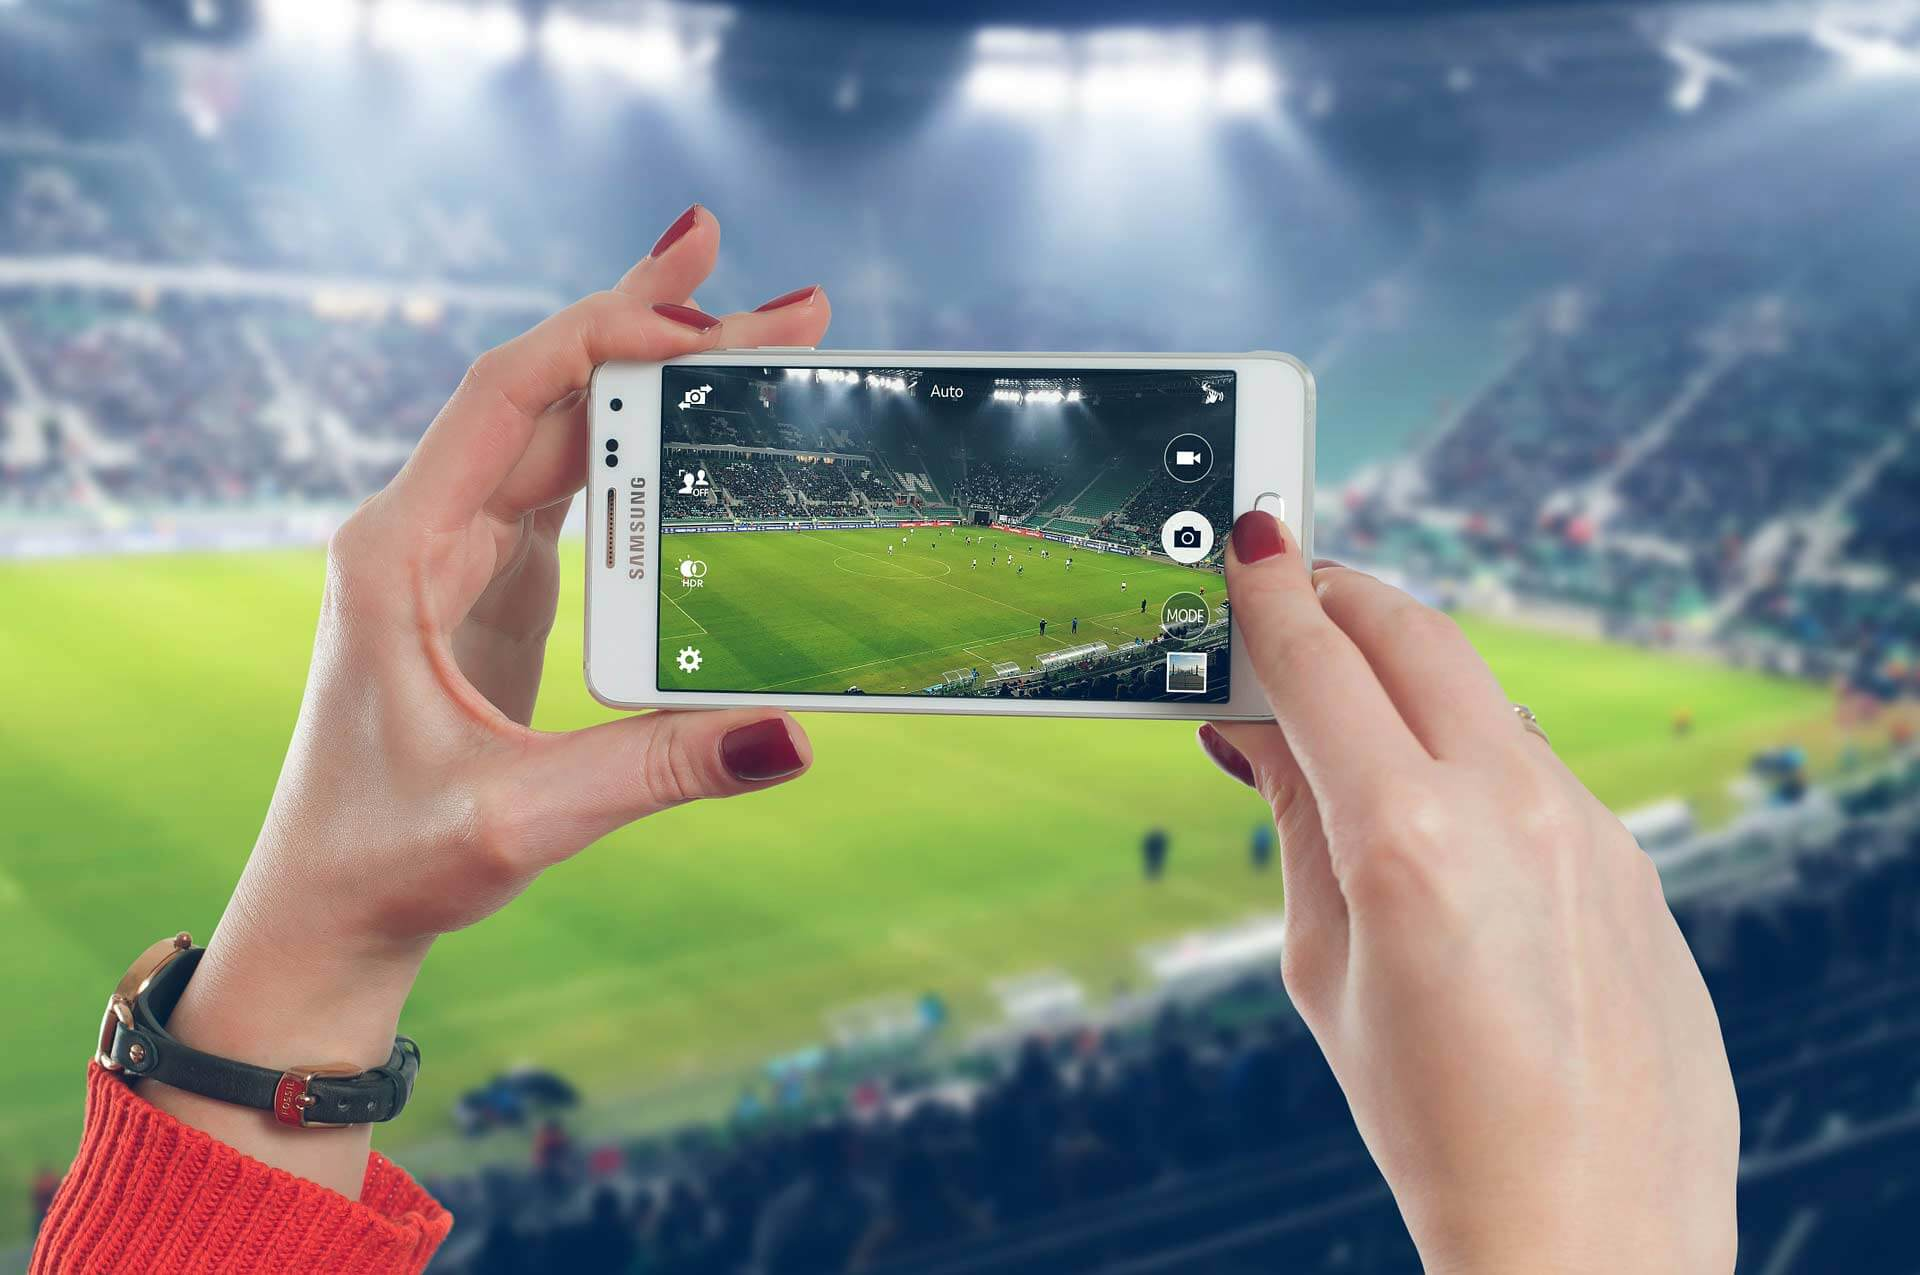 stavki-na-sport-onlajn-s-telefona